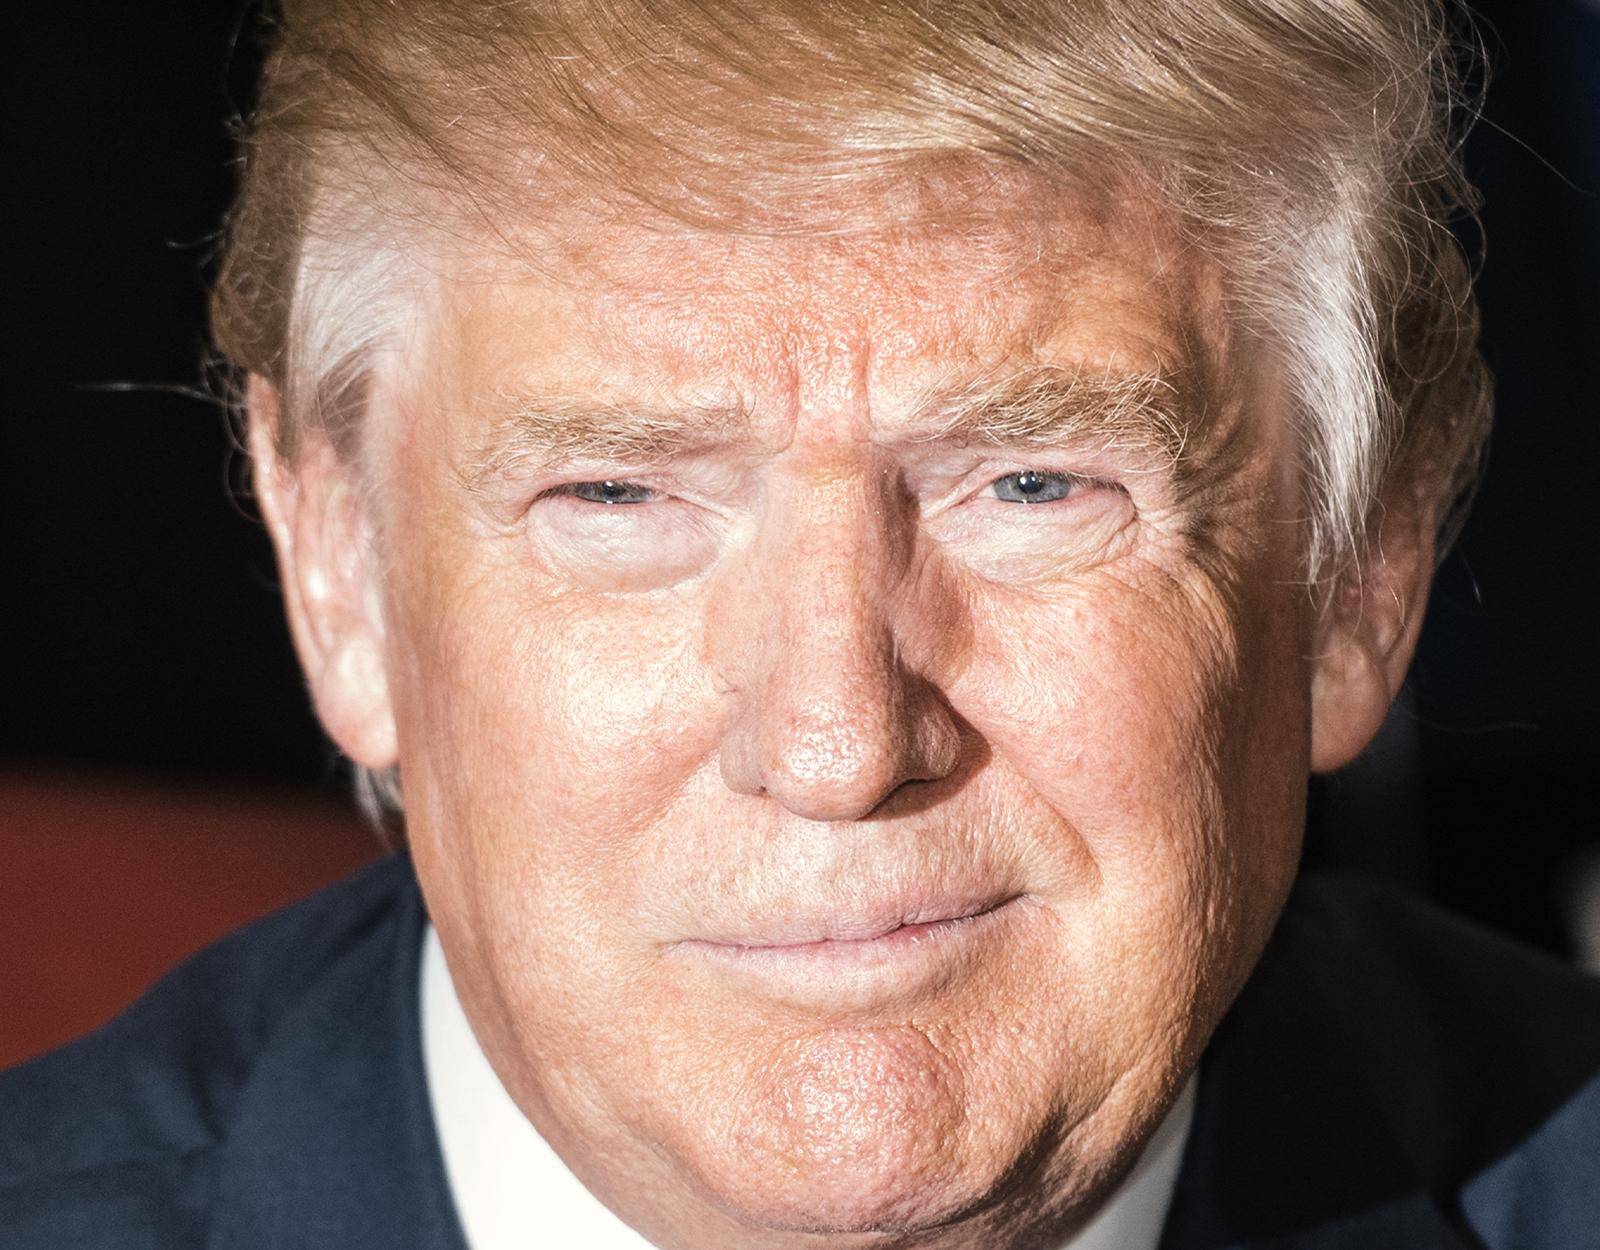 The Ignoble Presidency - The Bulwark